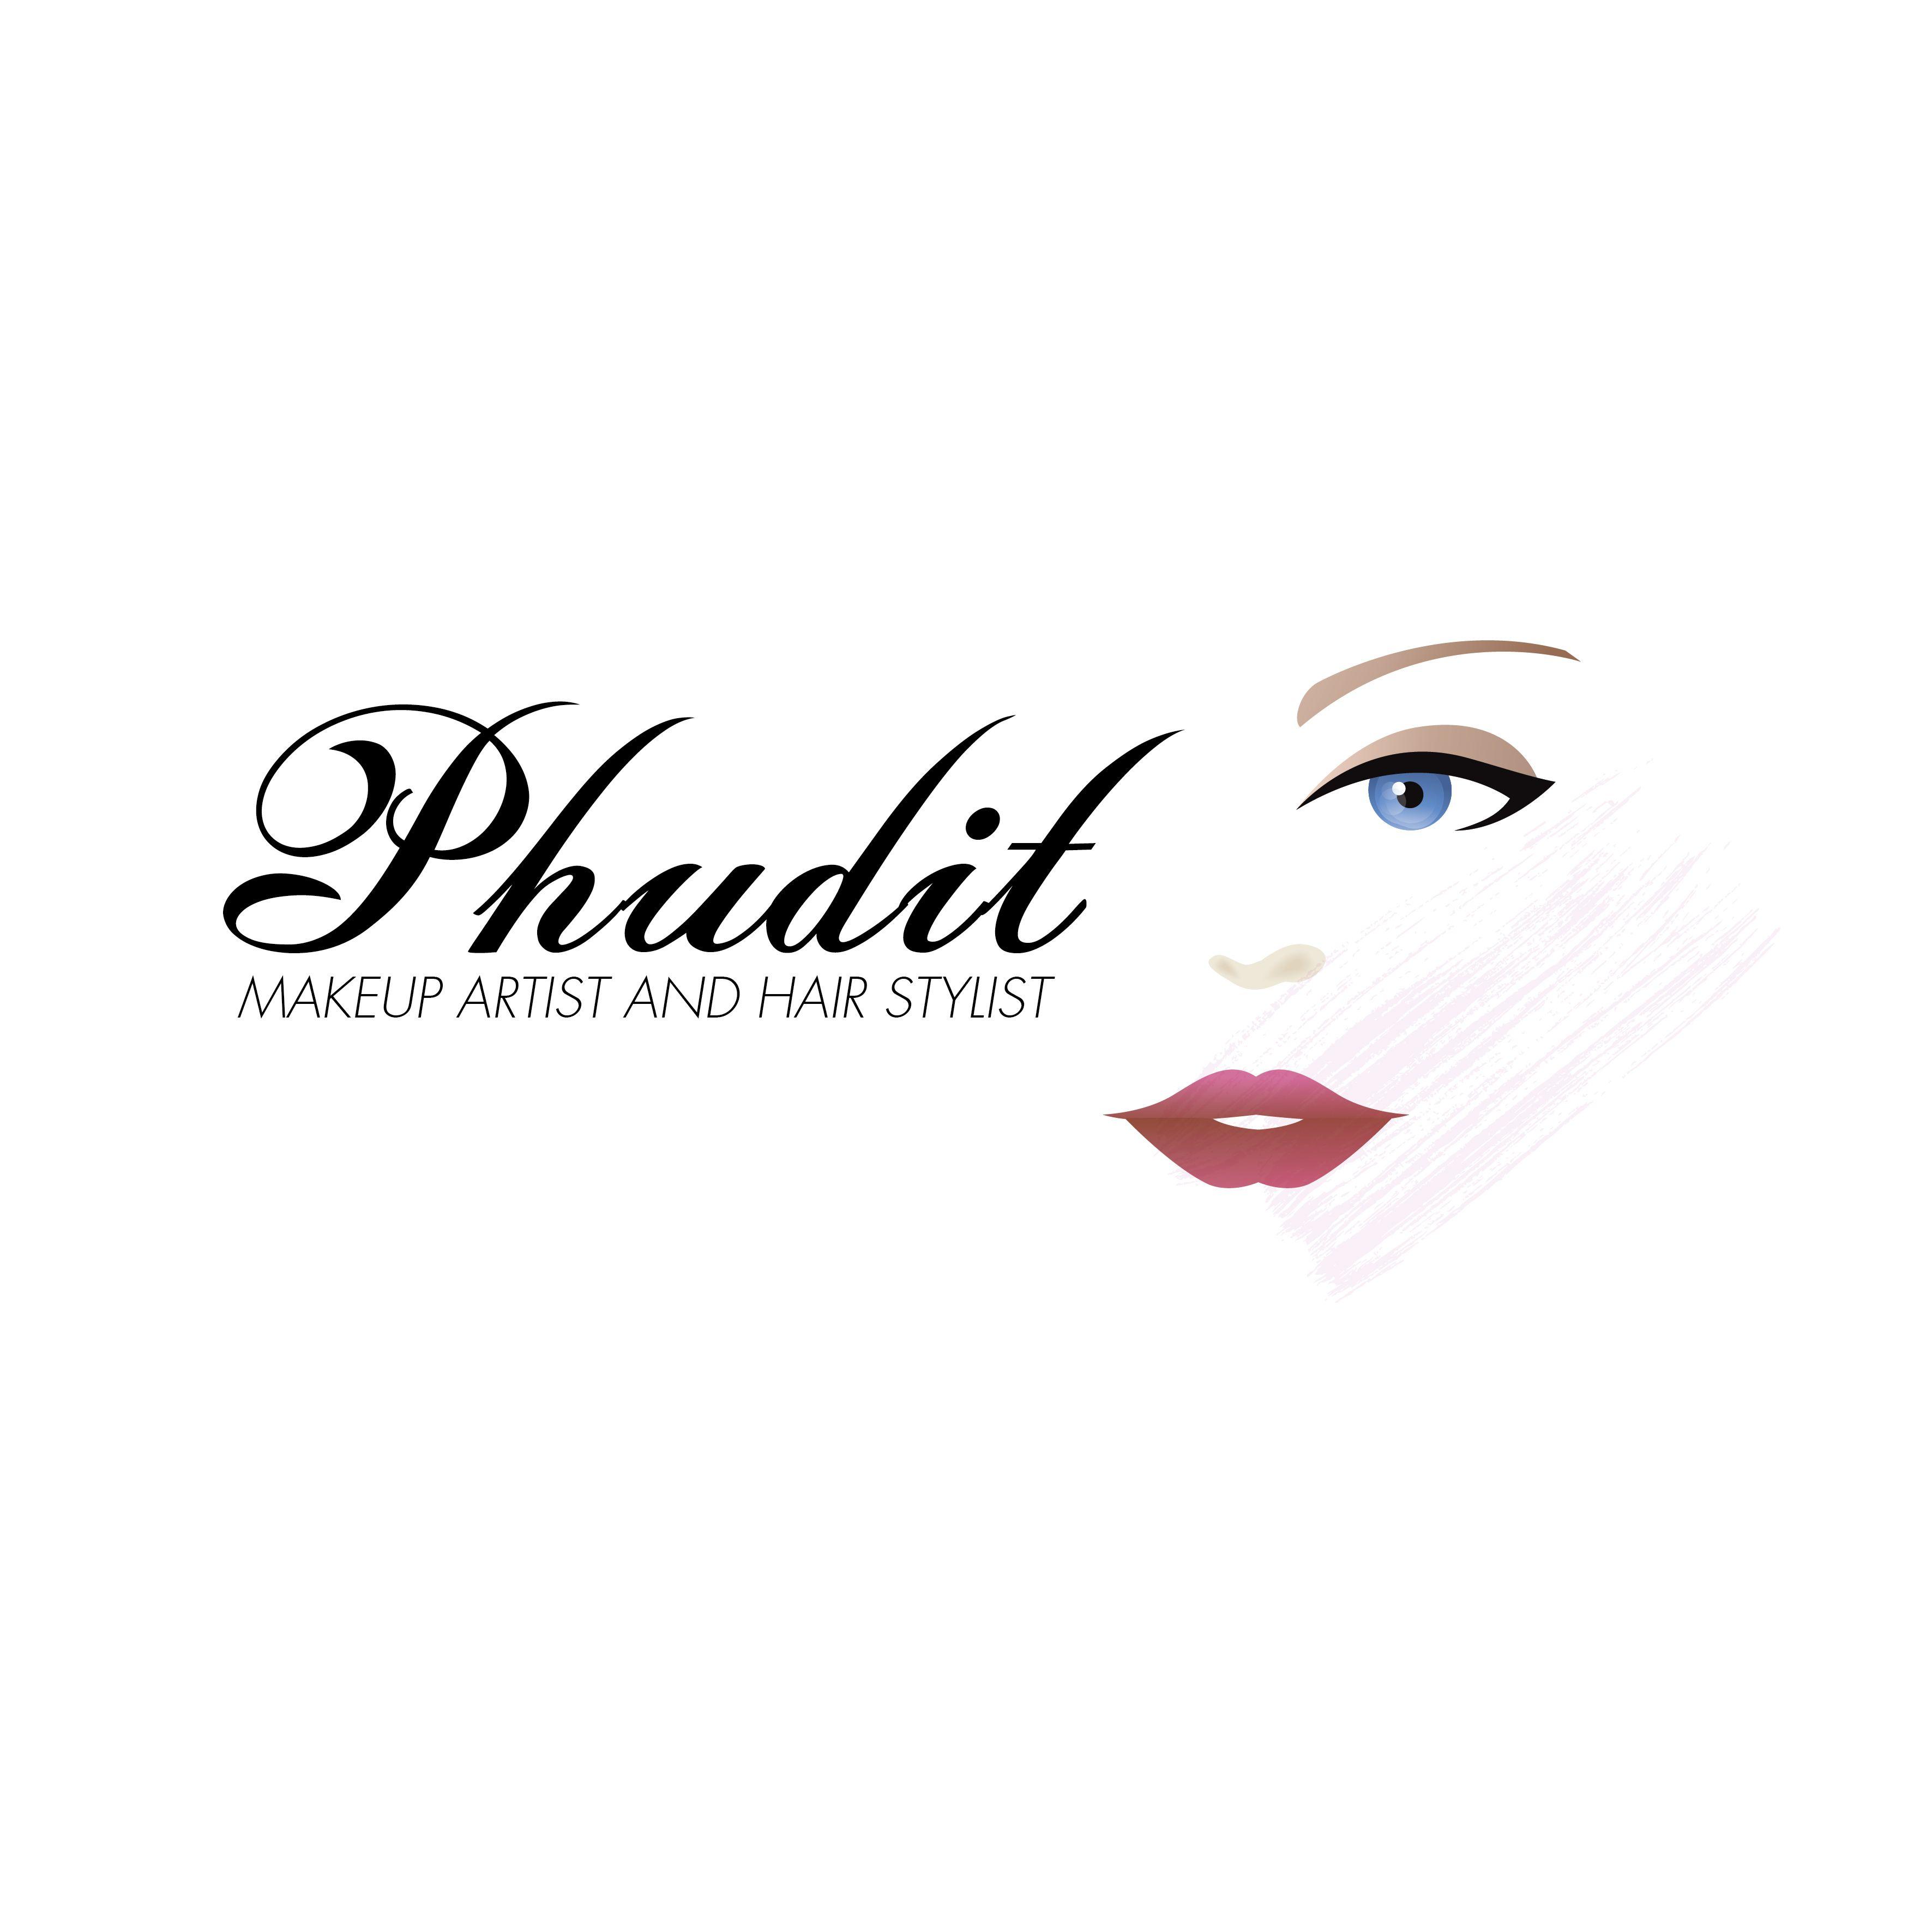 phuditmakeupartistlogo04jpg 35432153543 logo